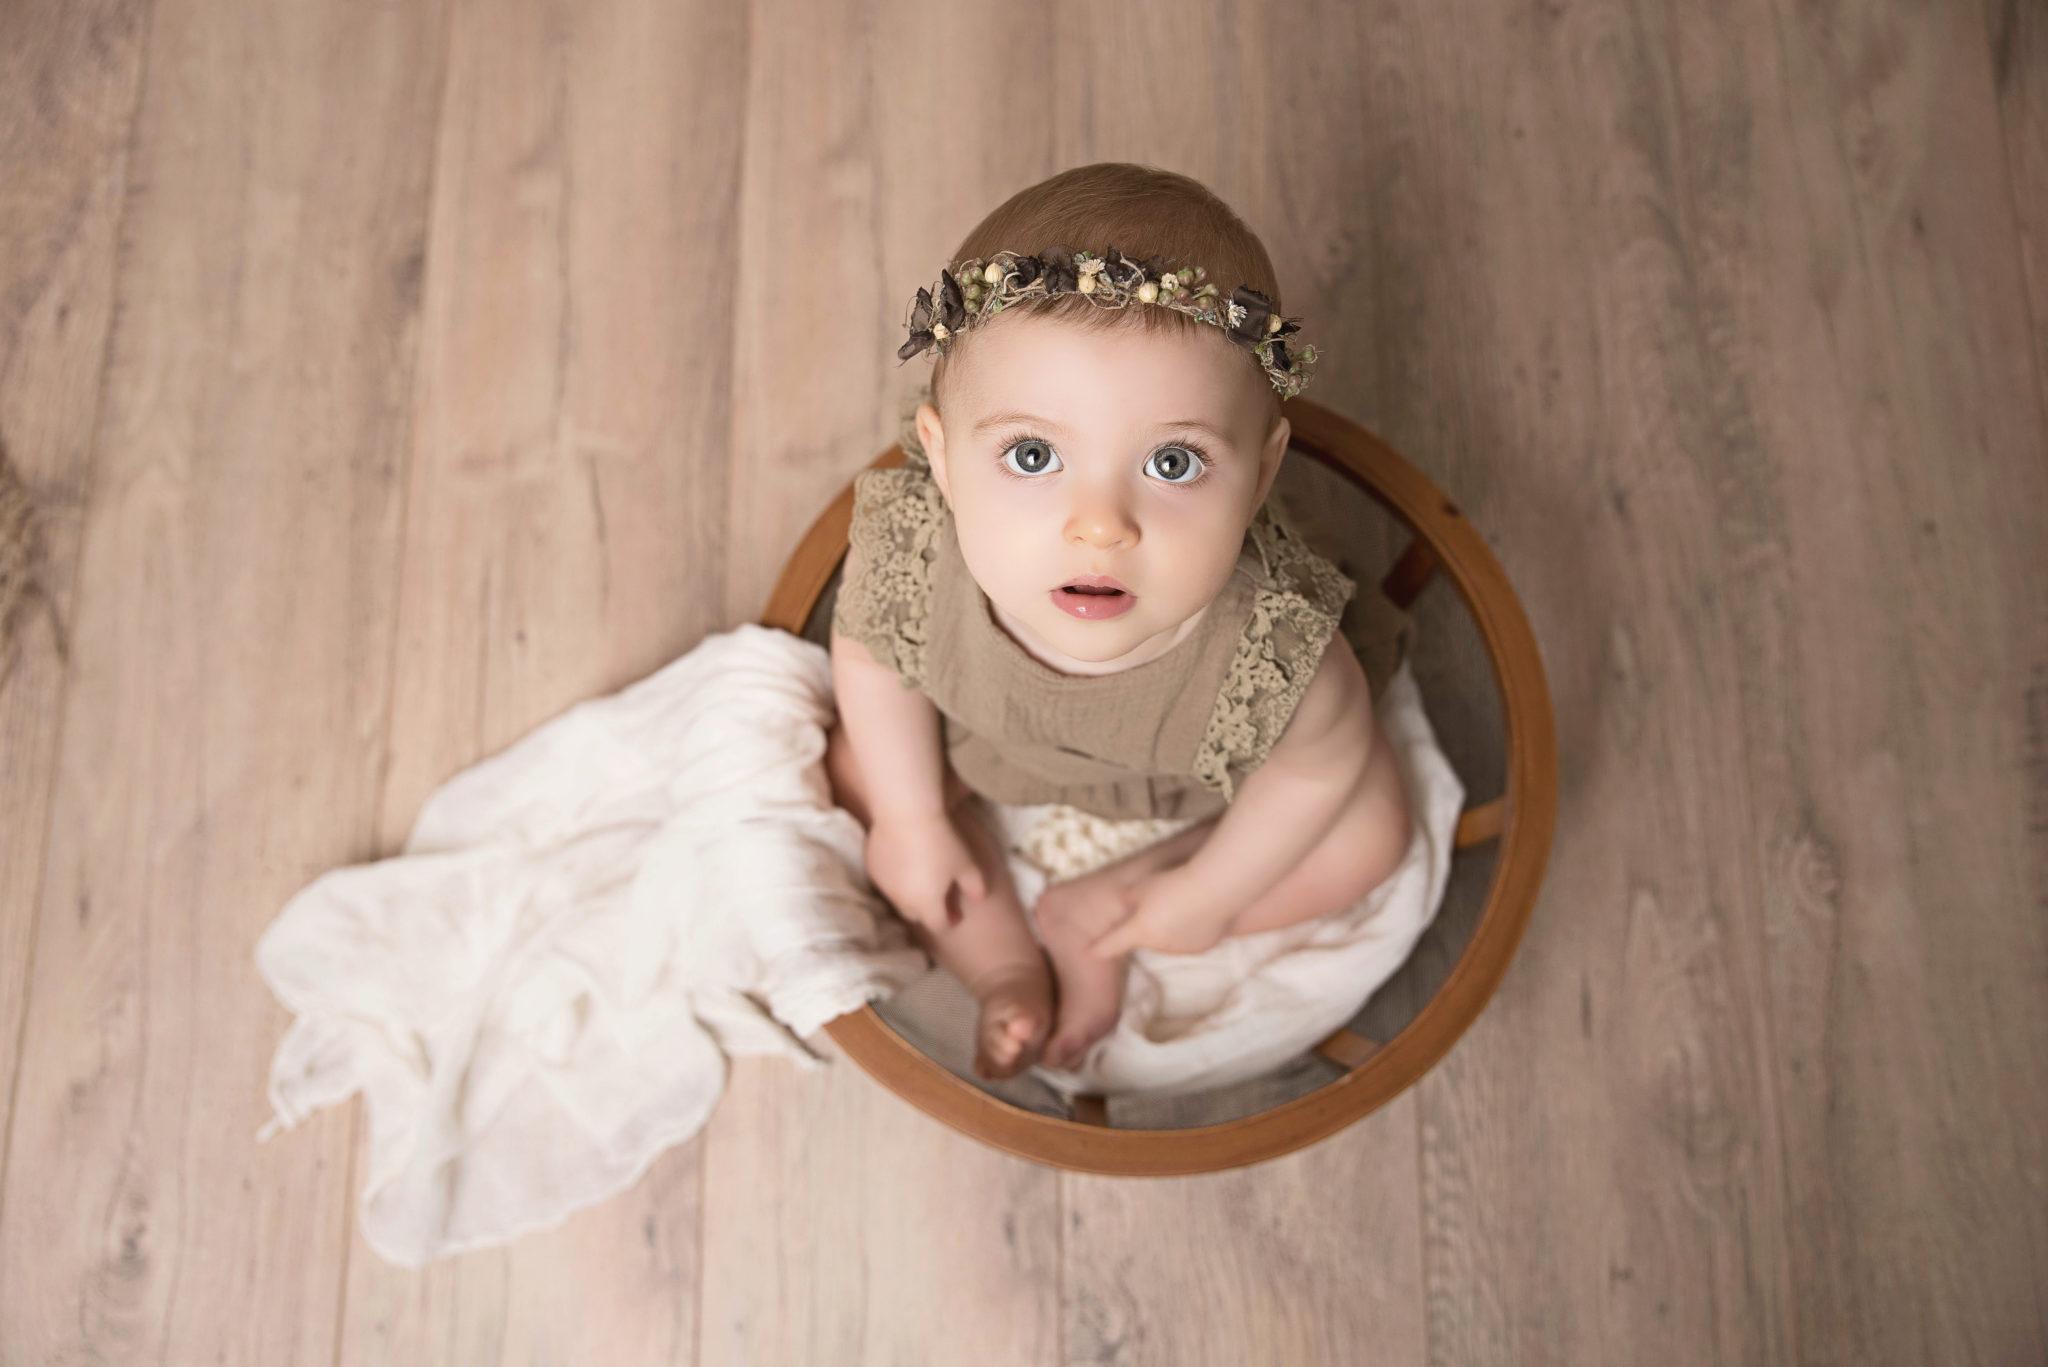 Photographe bébé oise seine et marne val d'oise ainse (28)